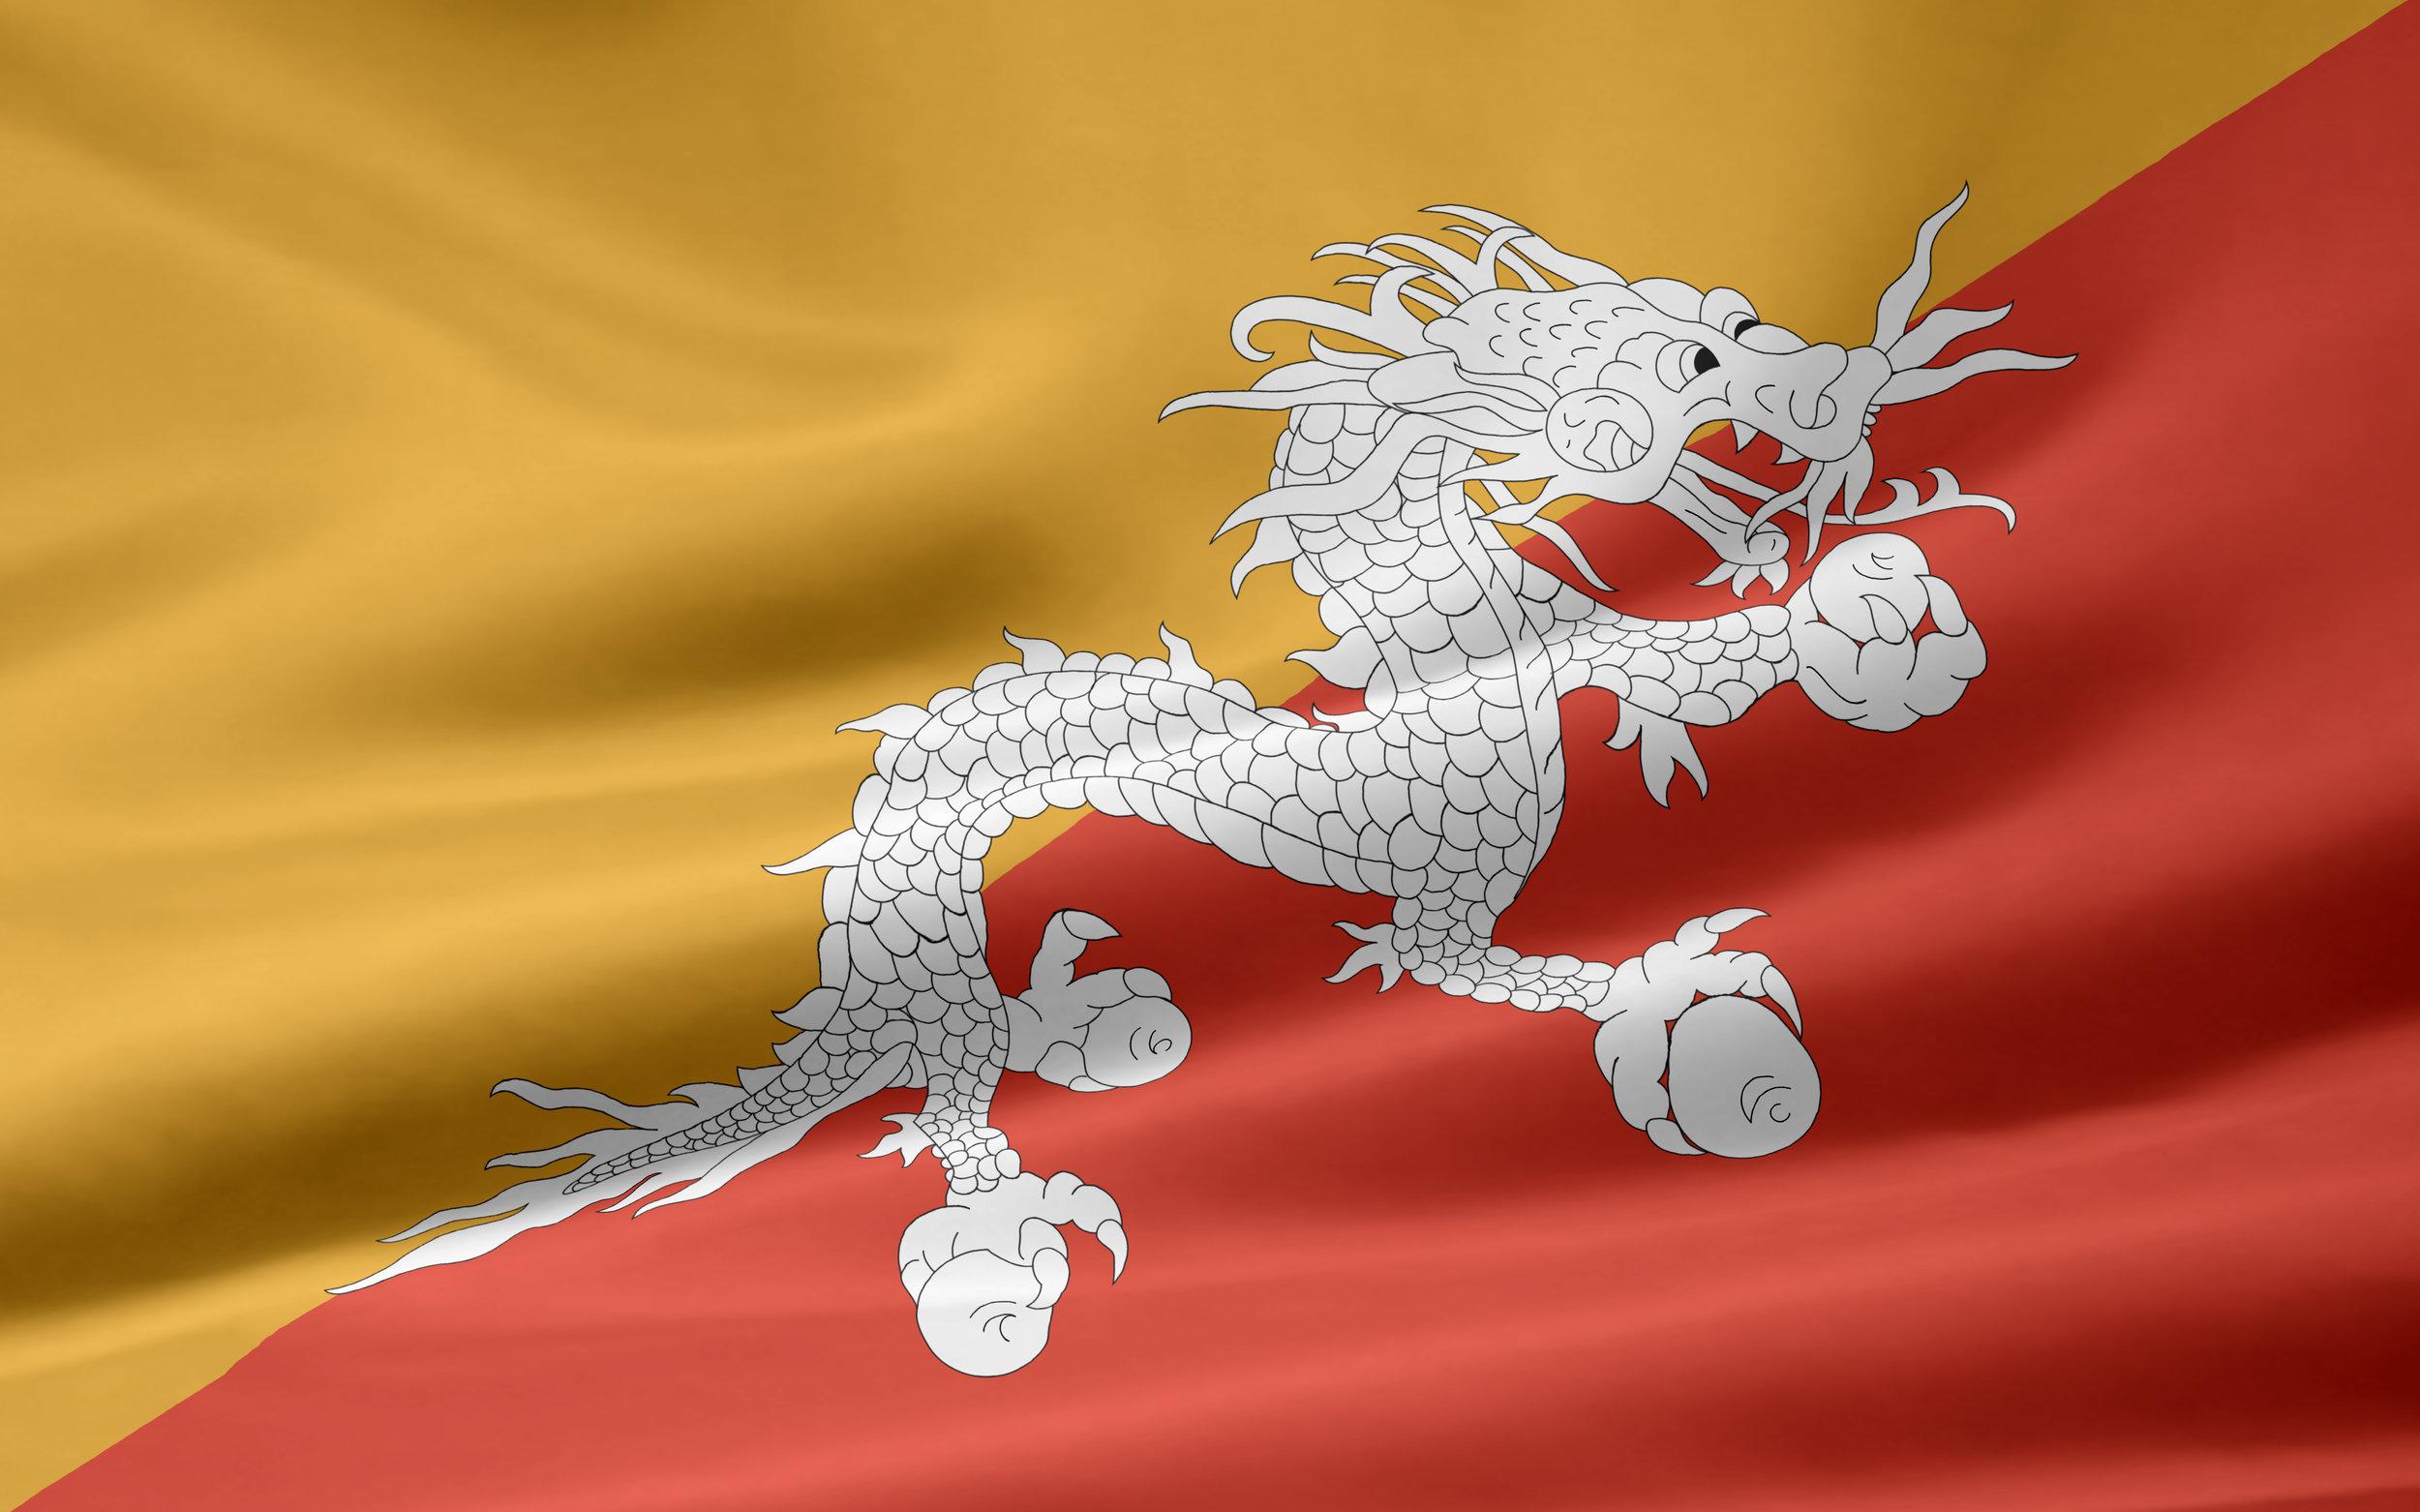 Flagget til bhutan skal ved den safrangule fargen symbolisere kongens makt, den oransjerøde står for buddhismens åndelige makt, og dragen skal symbolisere landet selv